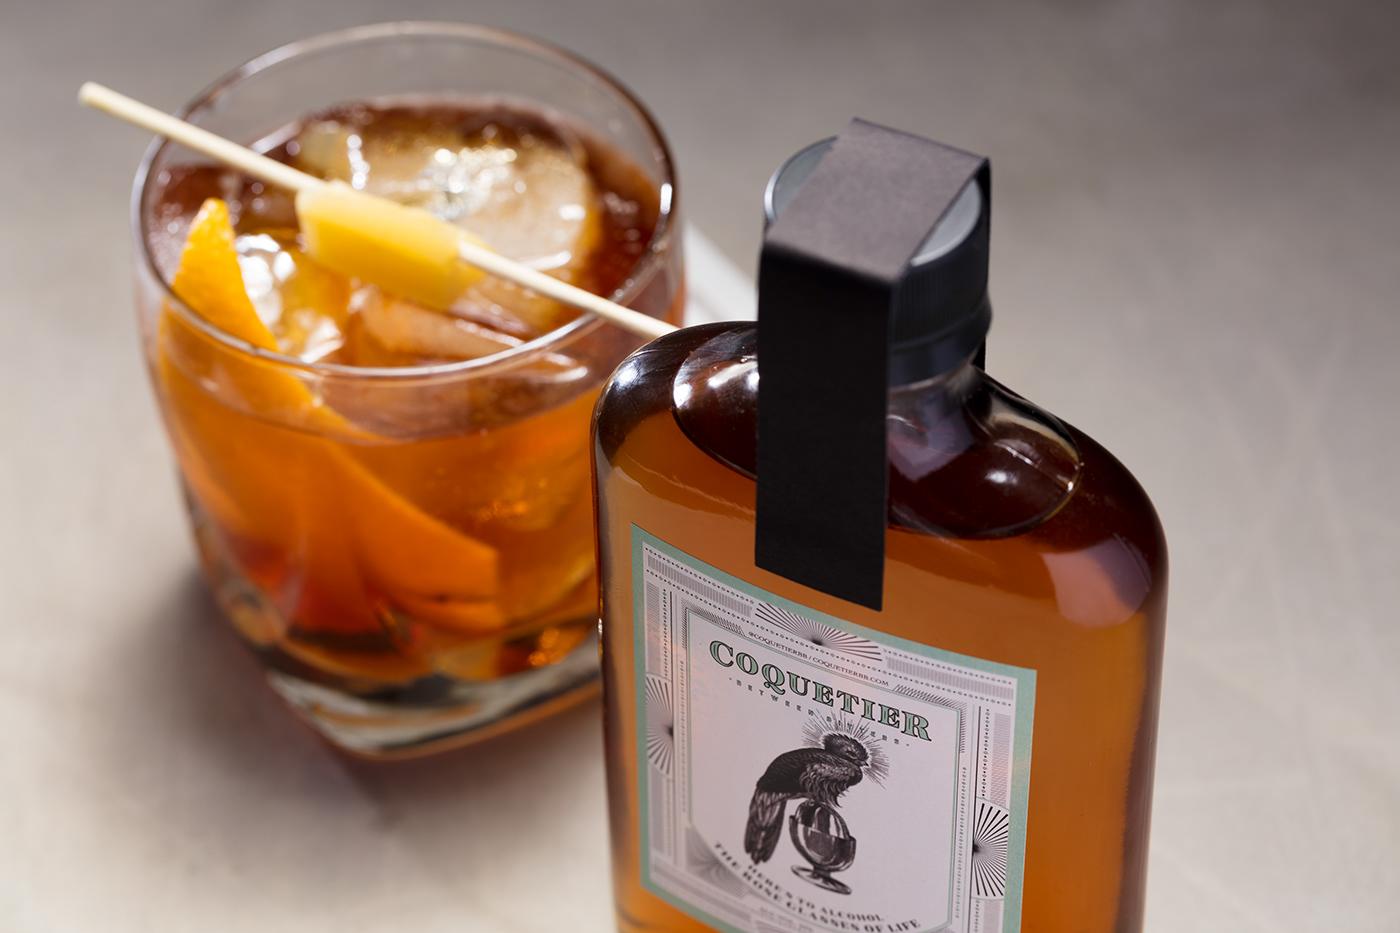 bar,bottle,branding ,cocktail,drinks,Label,mexico,Mixology,restaurant,Spirits